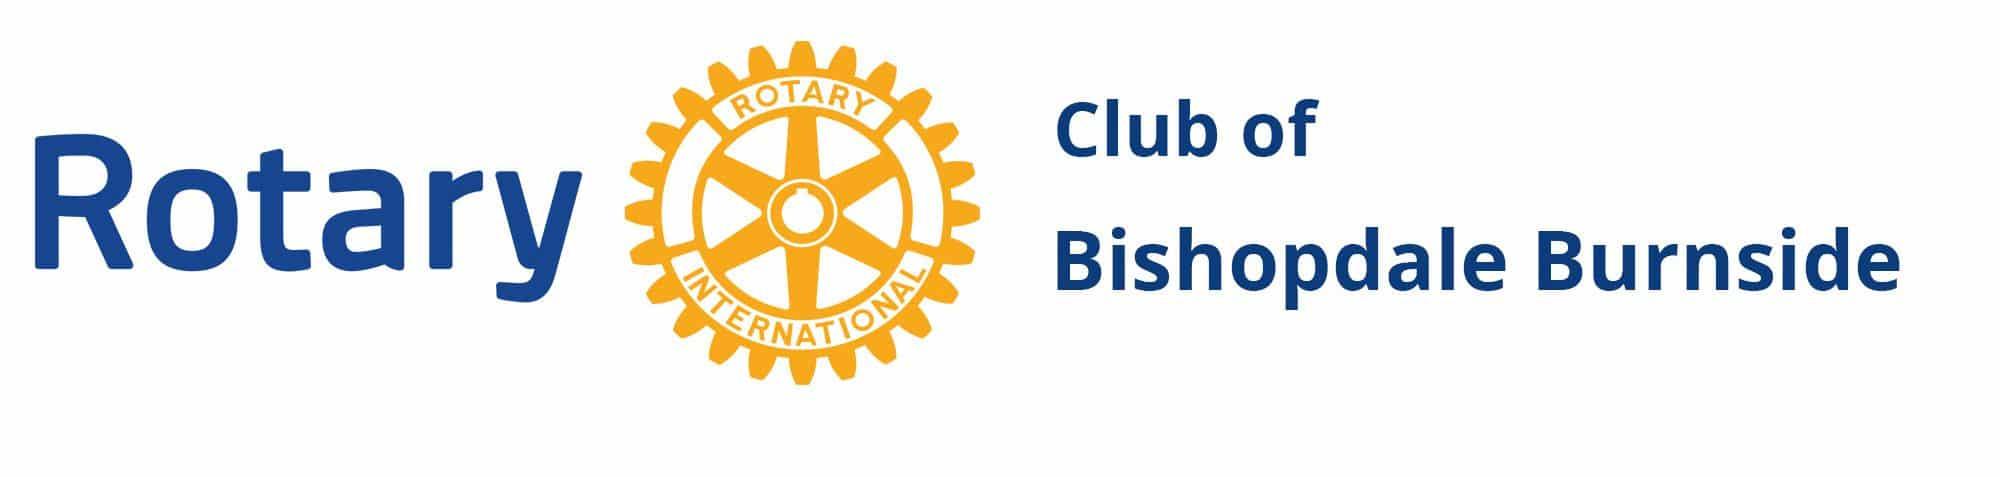 Bishopdale Burnside Rotary